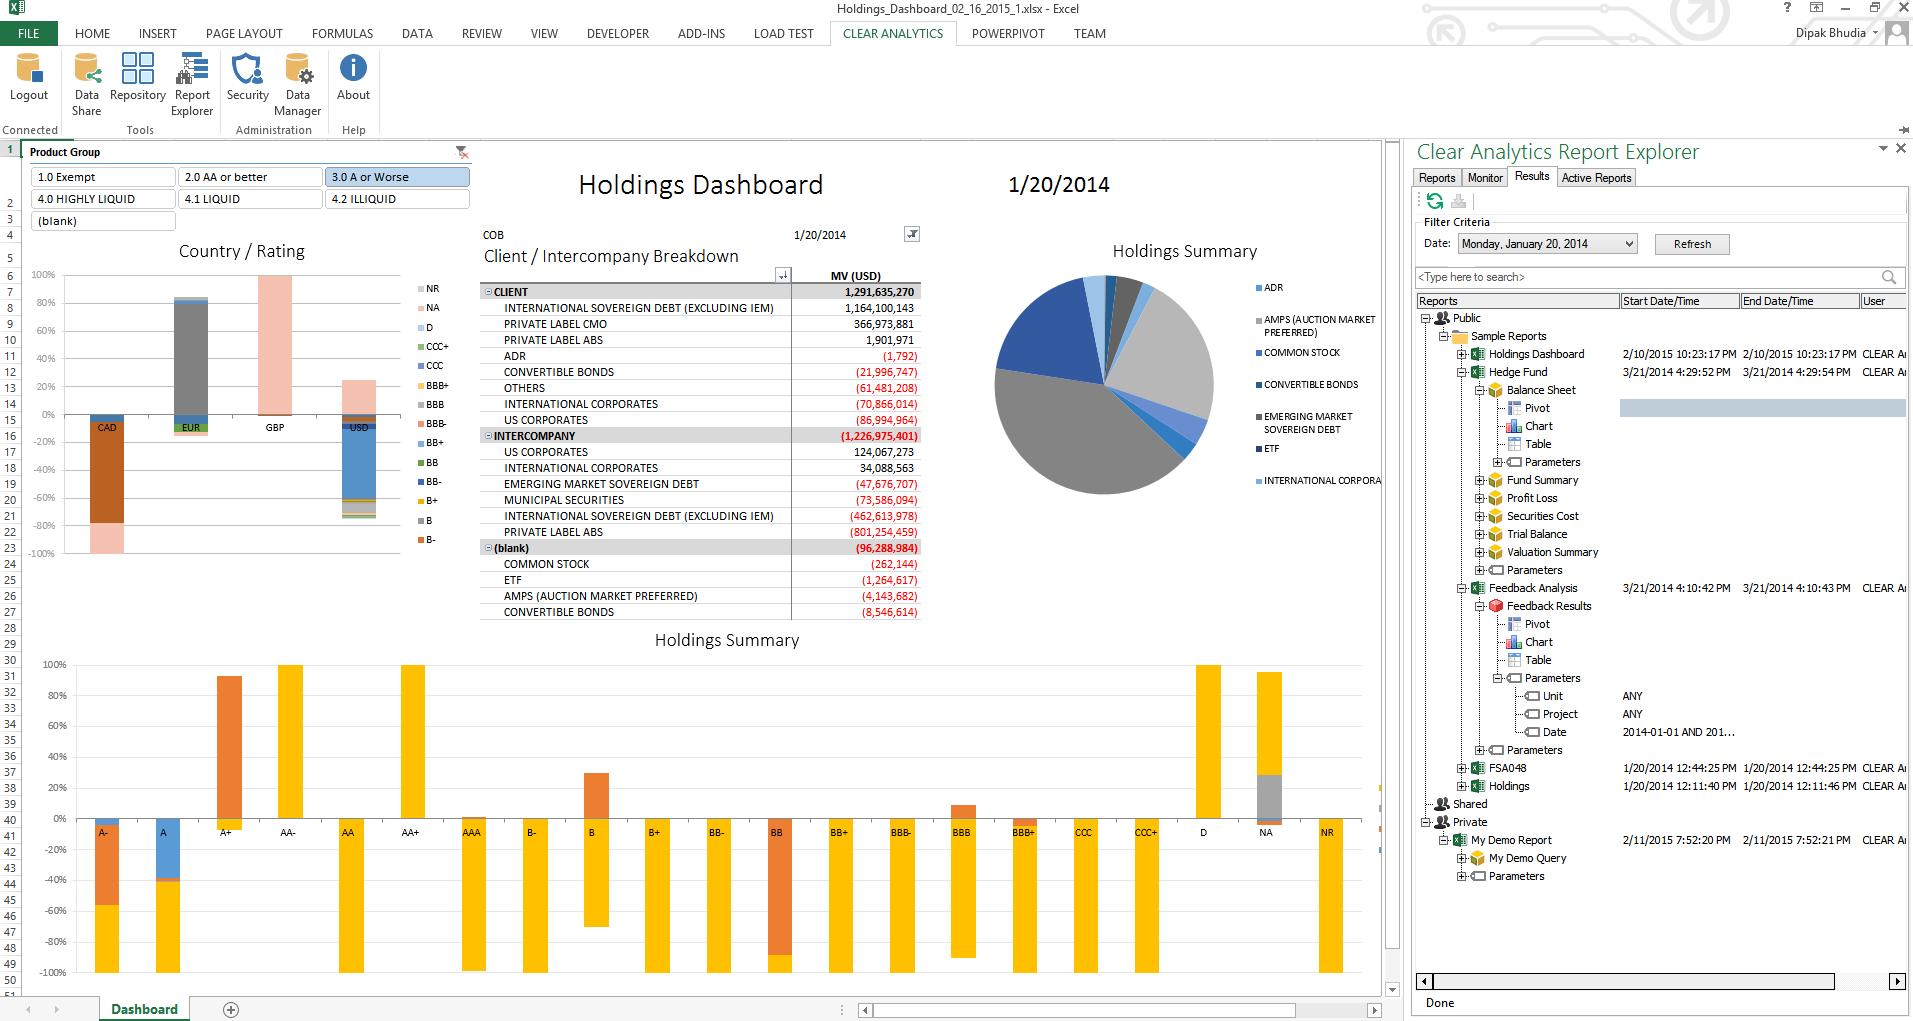 Holdings dashboard